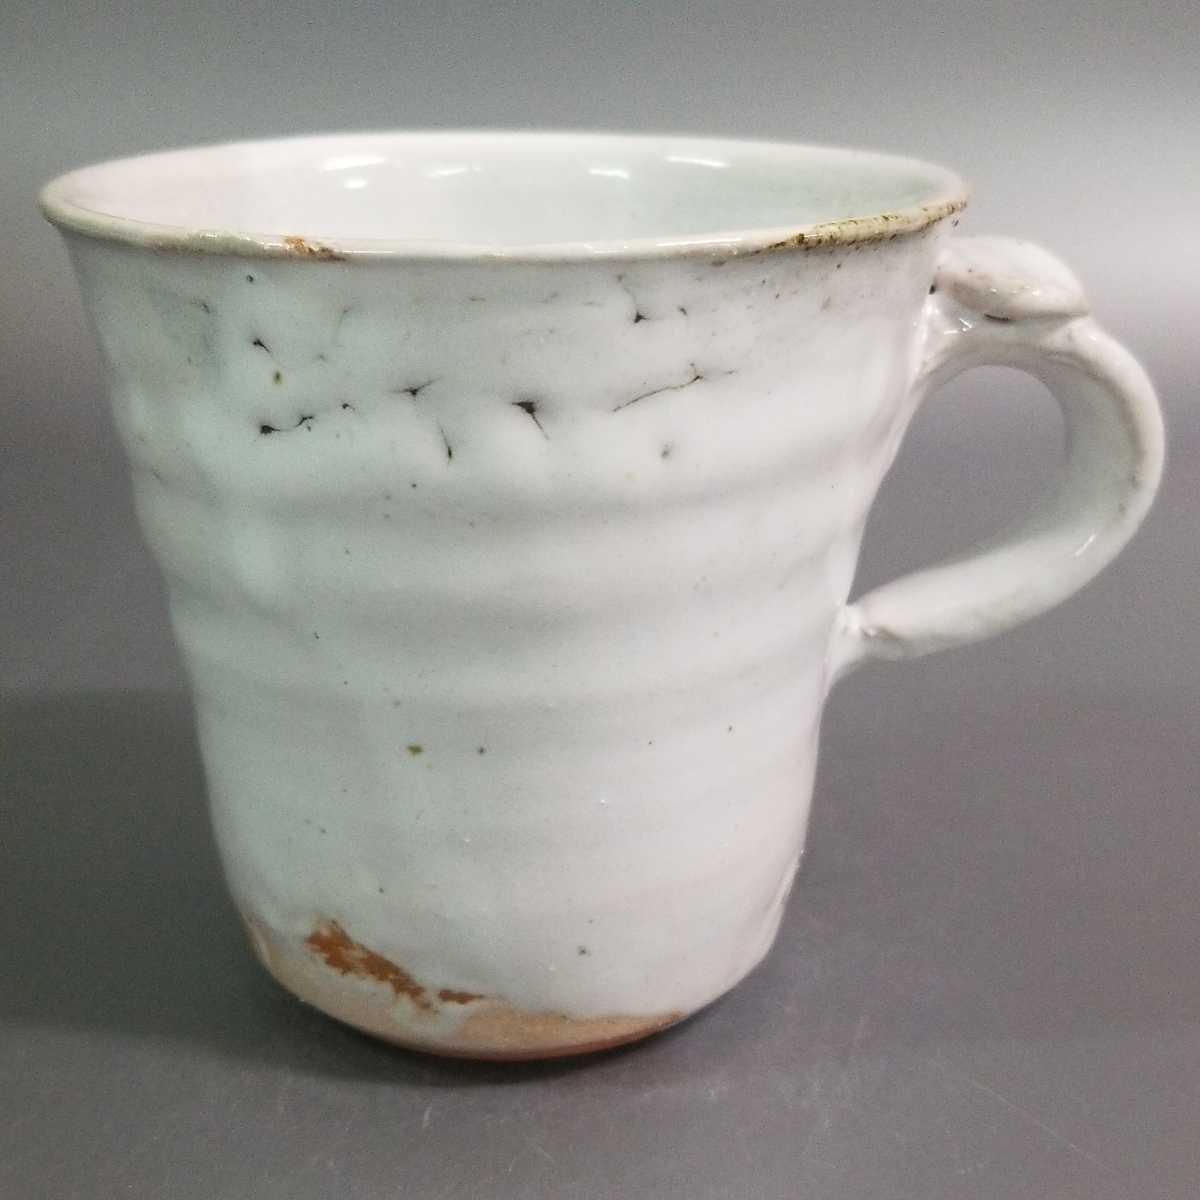 賜72)萩焼 渋谷泥詩 白萩マグカップ 珈琲器 茶器 未使用新品 同梱歓迎 _画像1